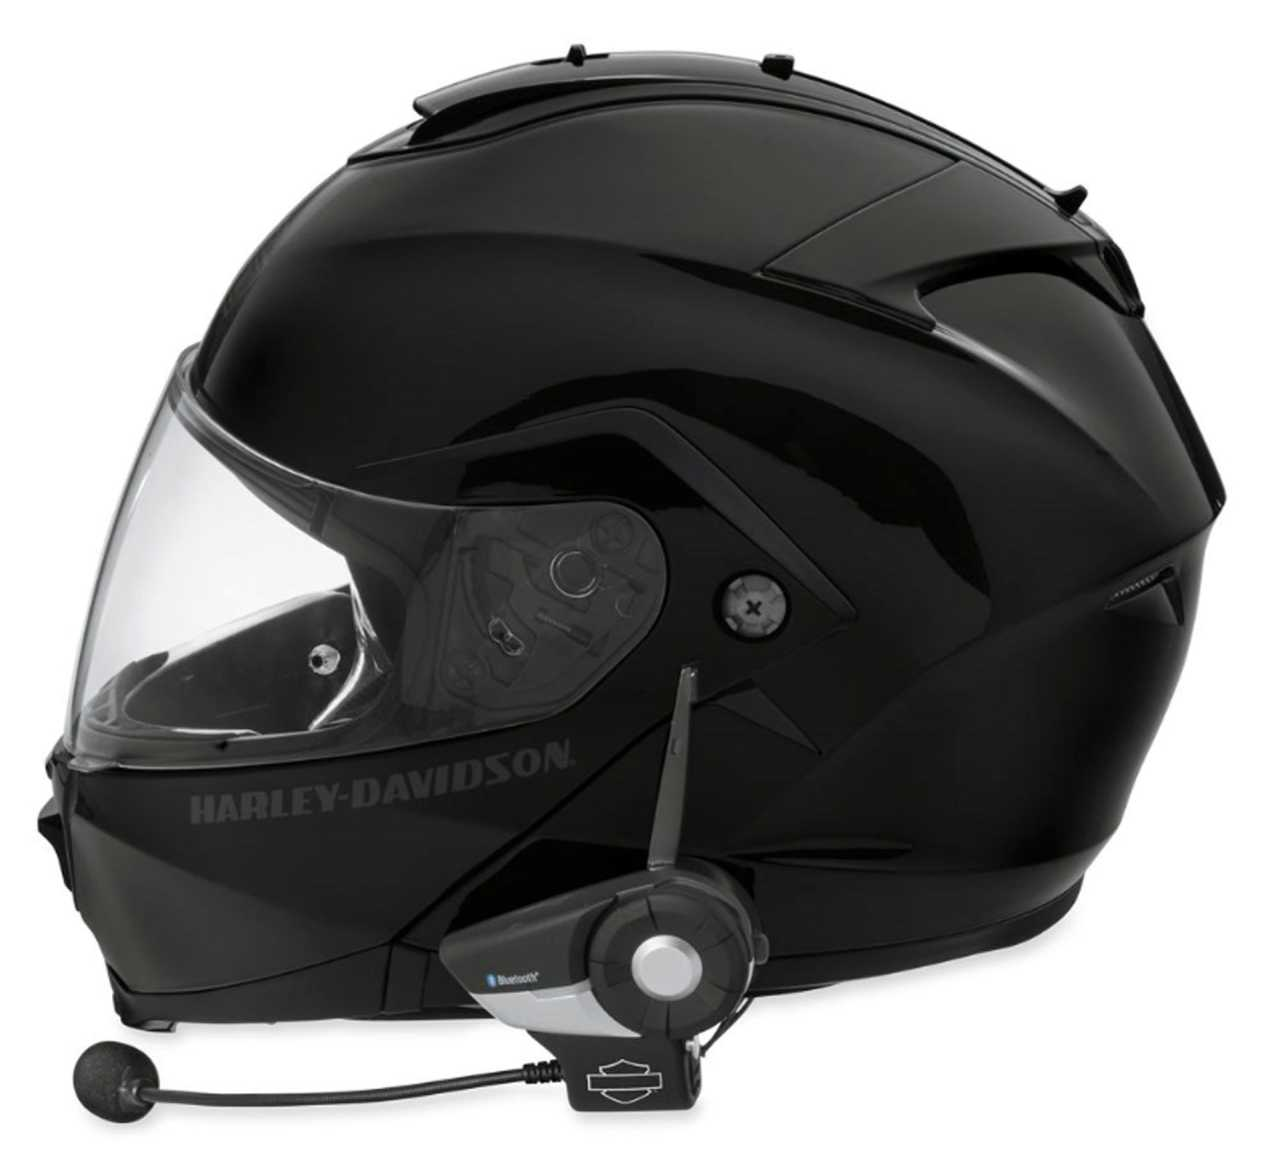 76000736a boom audio 20s bluetooth helmet single headset. Black Bedroom Furniture Sets. Home Design Ideas